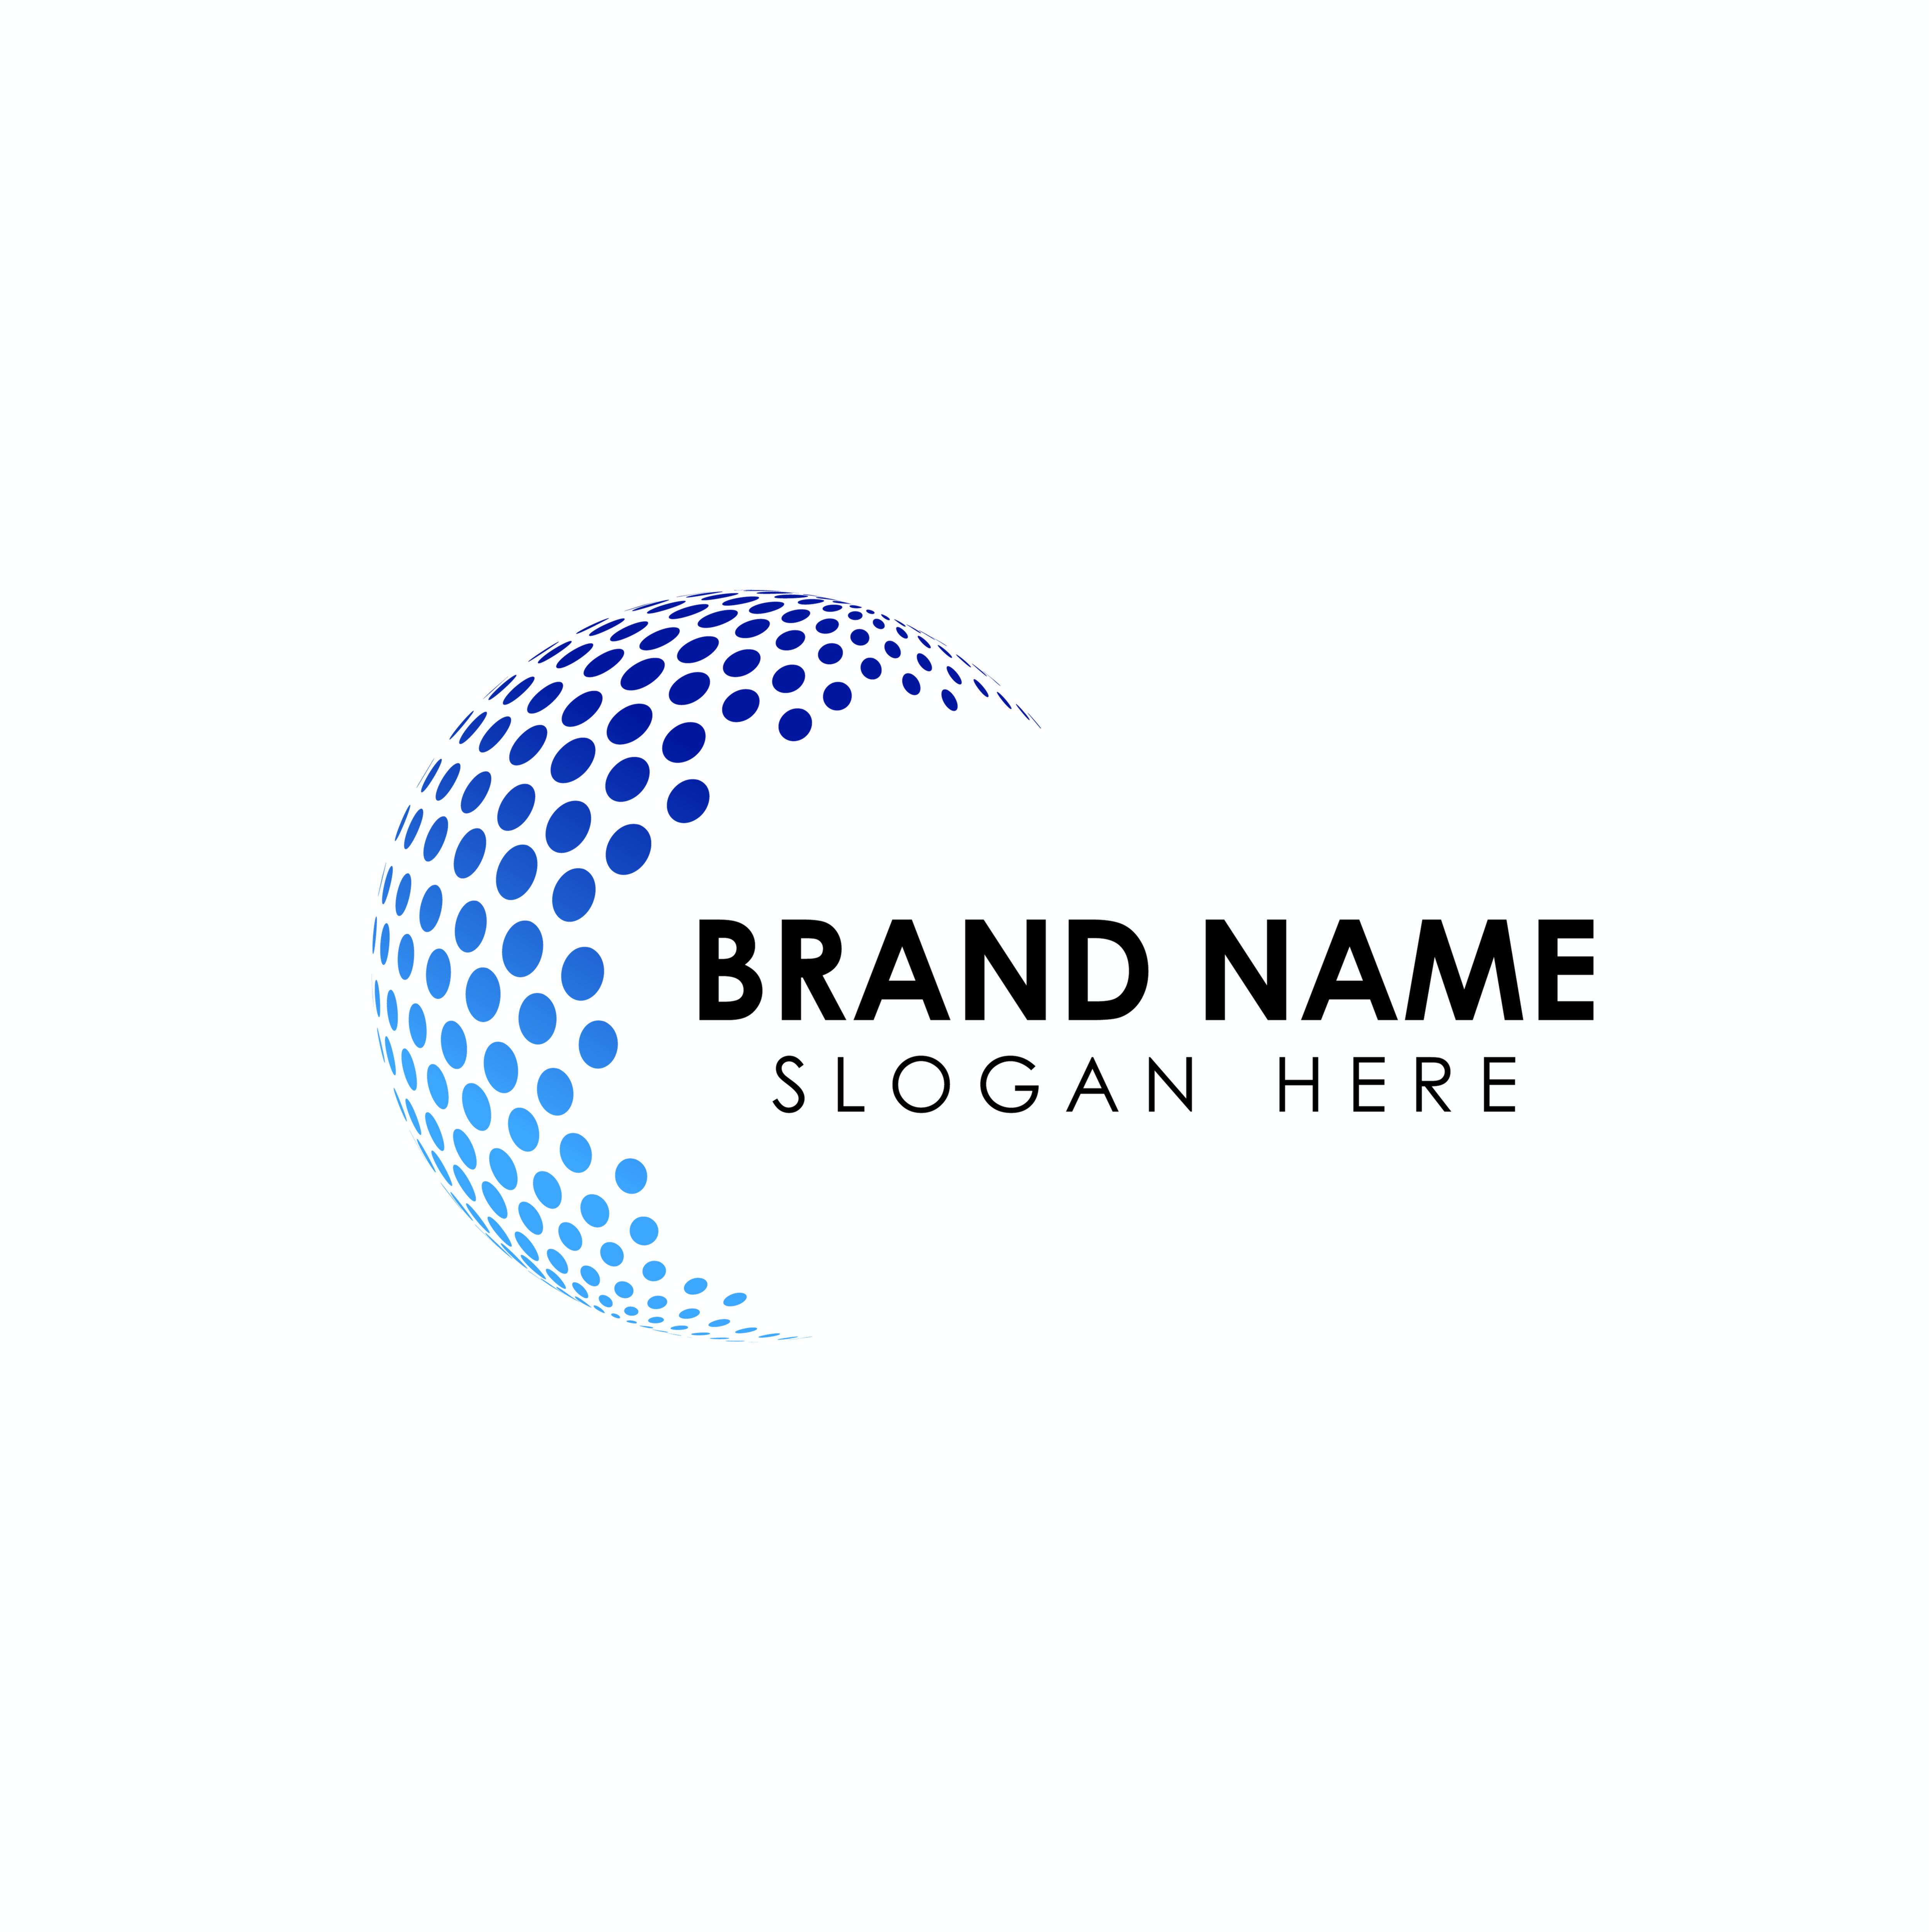 Logo and Branding Services Central Florida